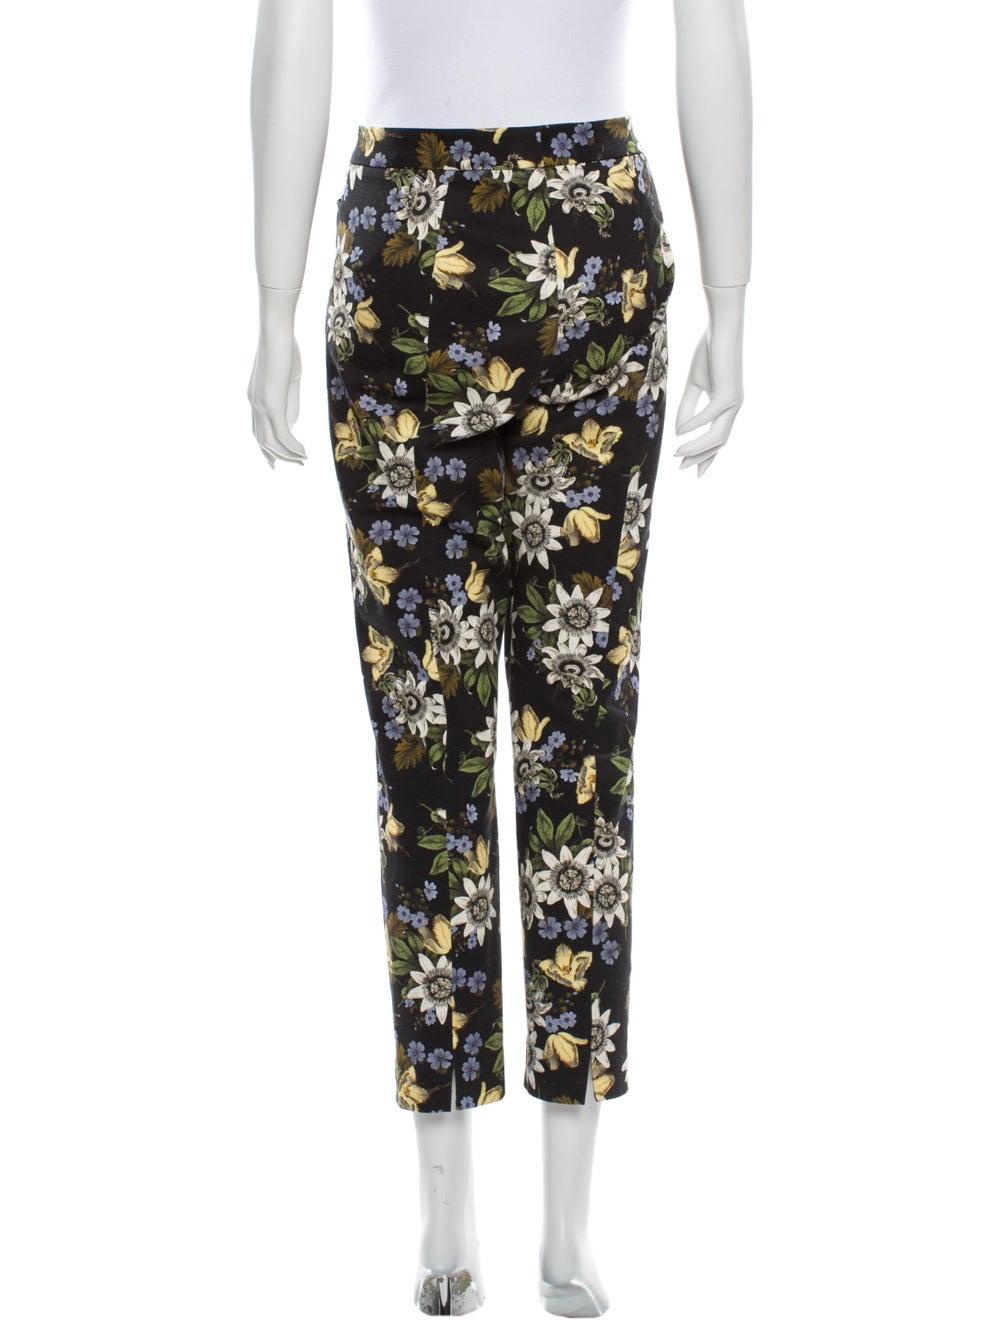 Erdem Floral Print Straight Leg Pants Black - image 3